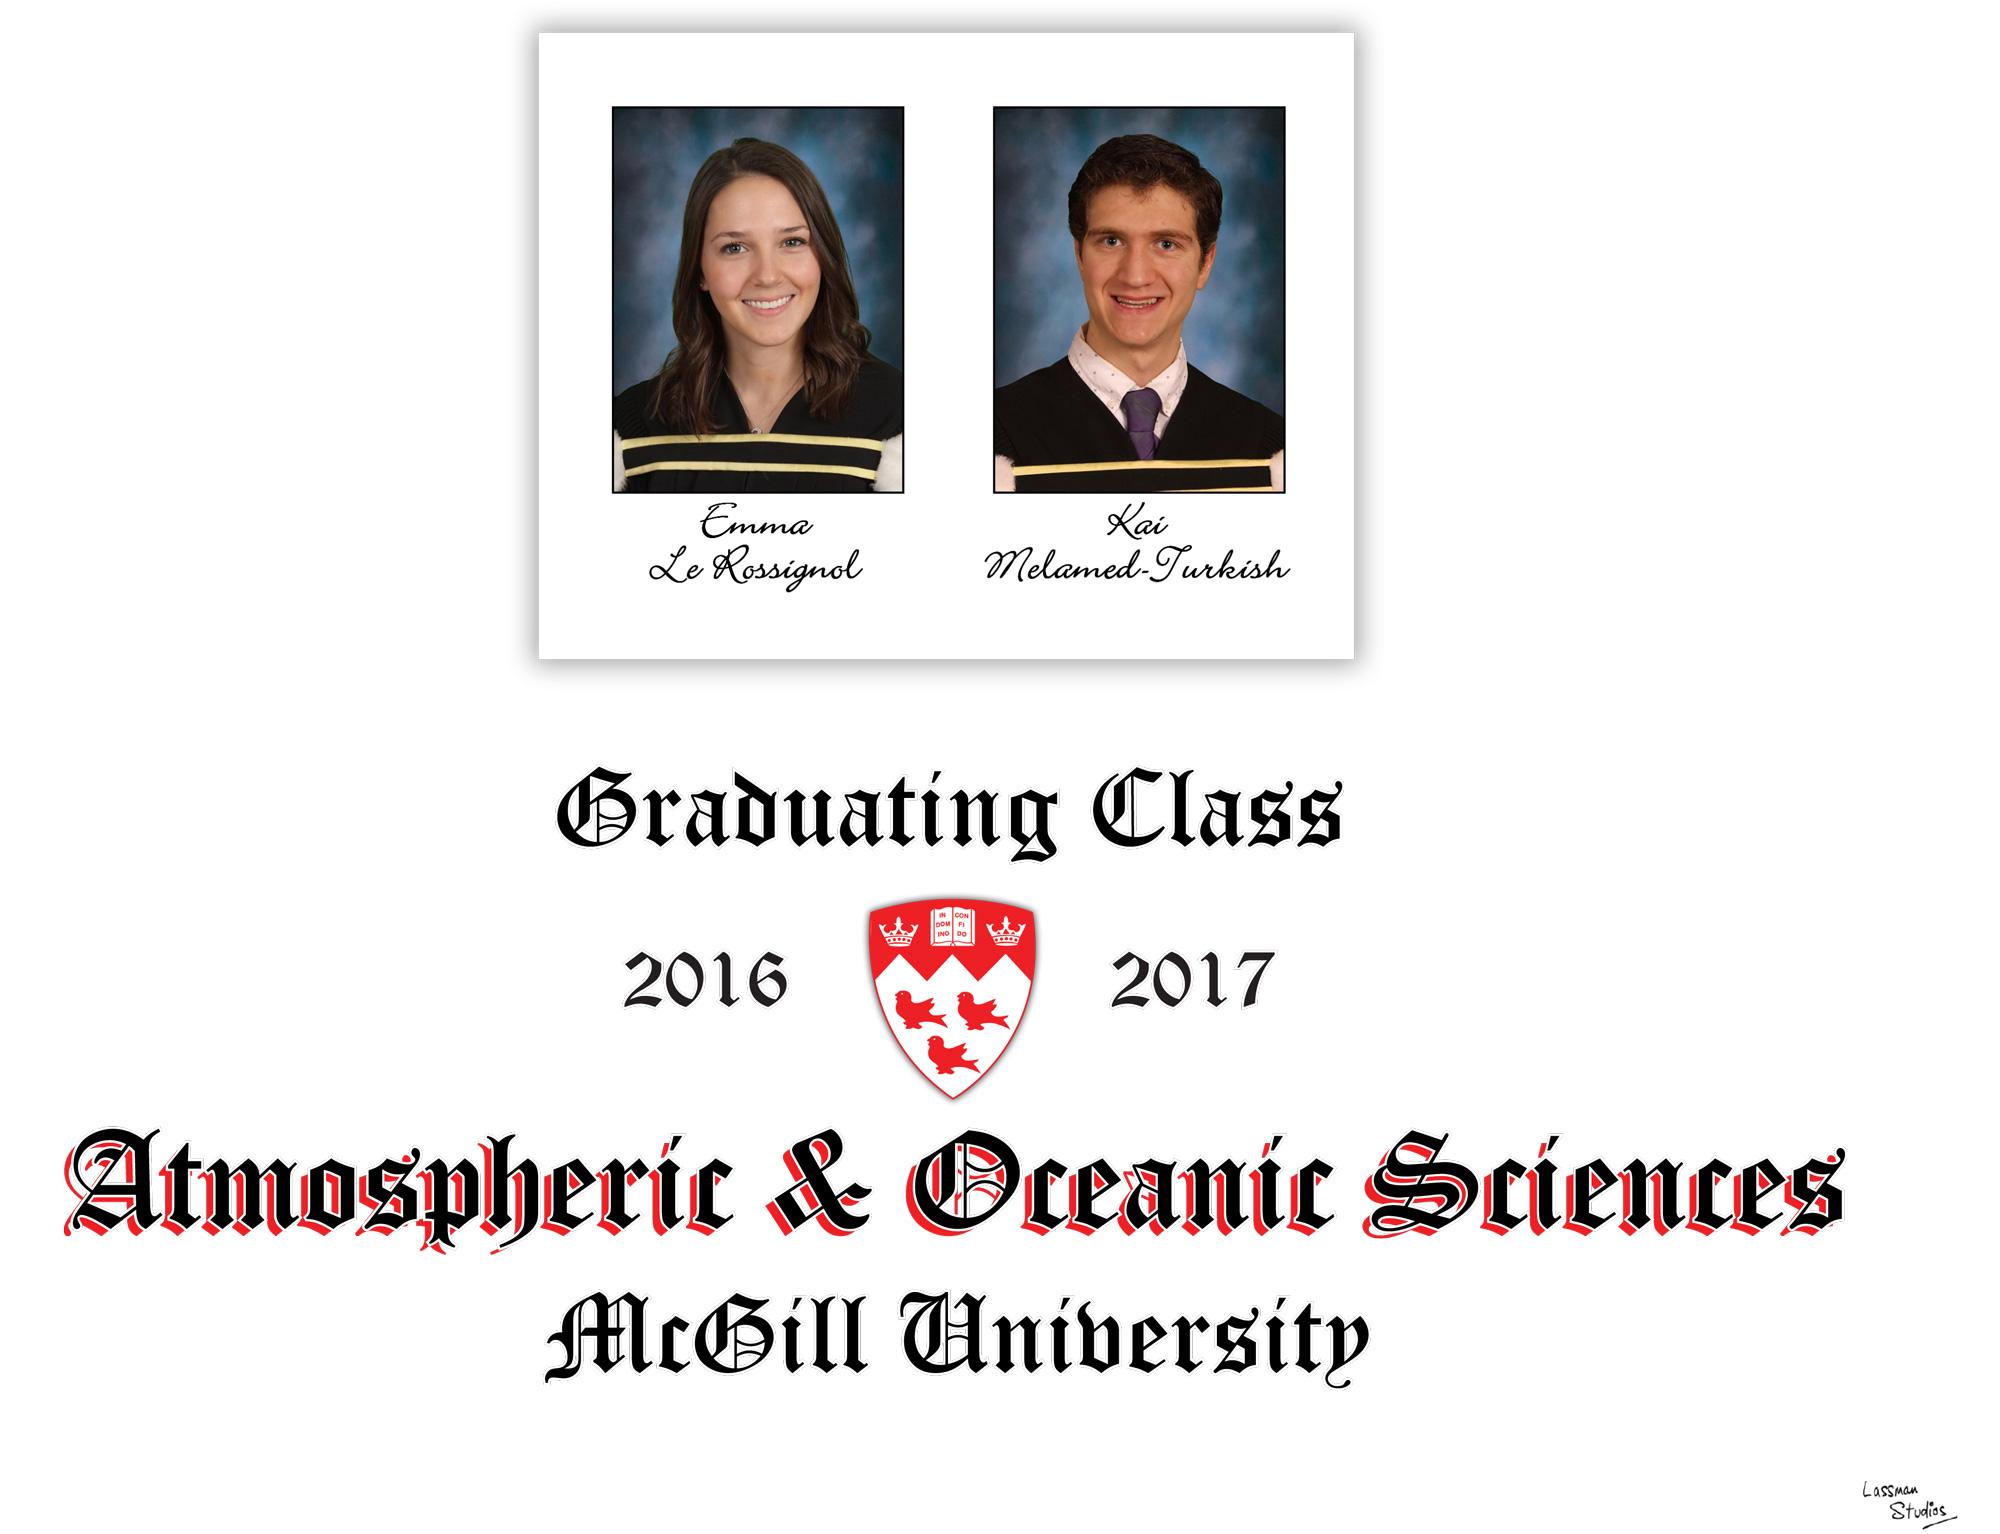 Mosaics-2017-Atmospheric-and-Ocean-Sciences